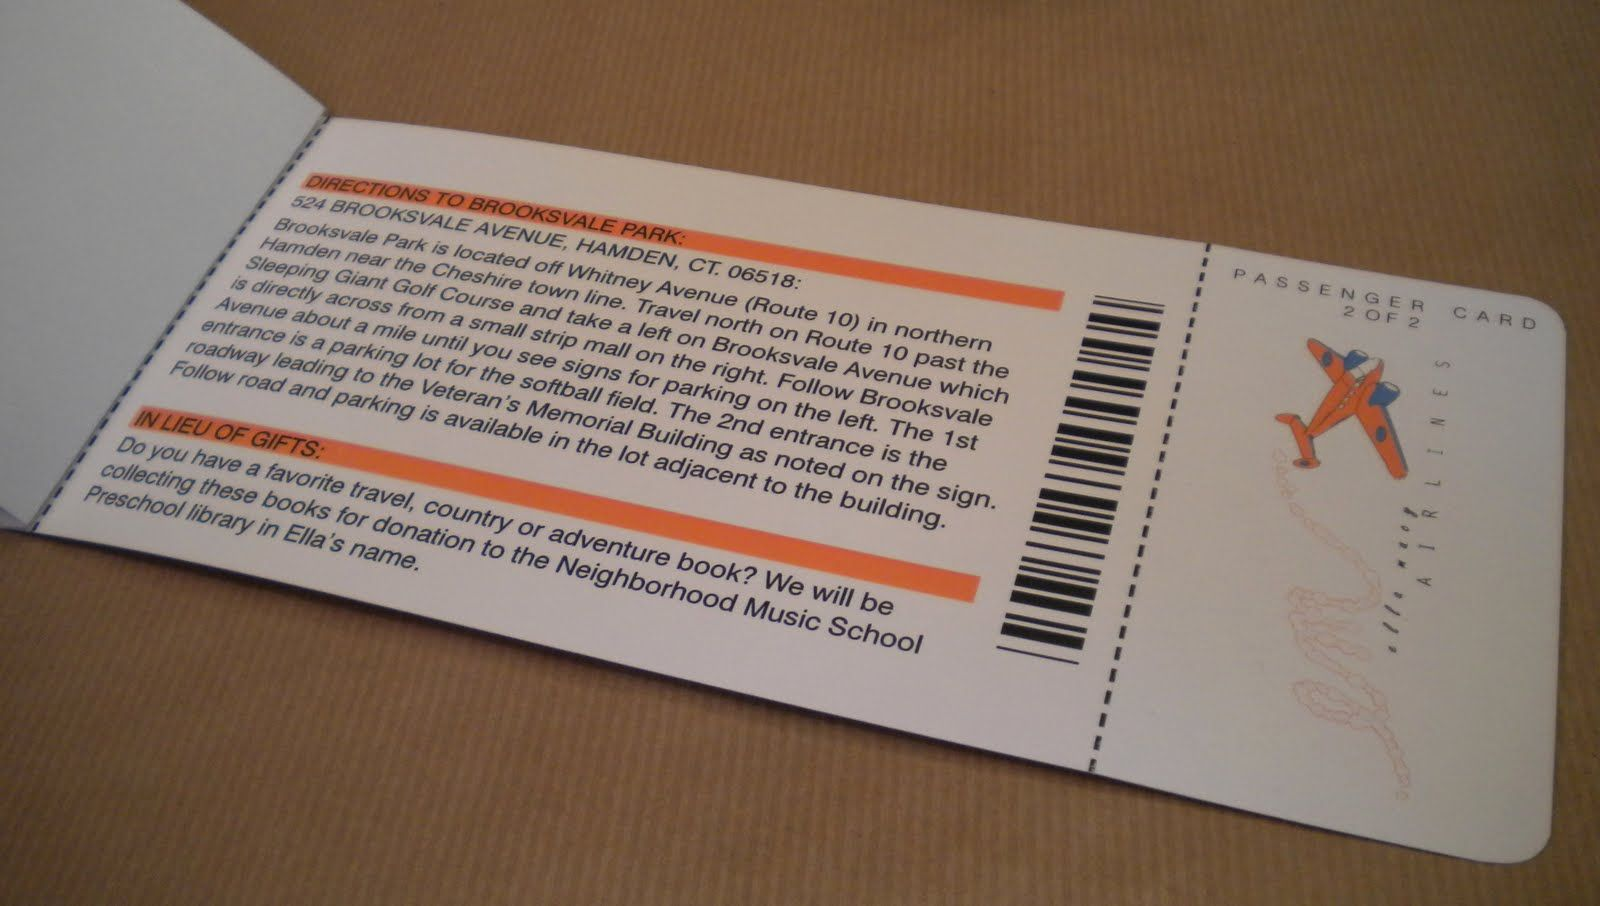 Invitation Card Boarding Pass Rear Side Add Lucky Draw